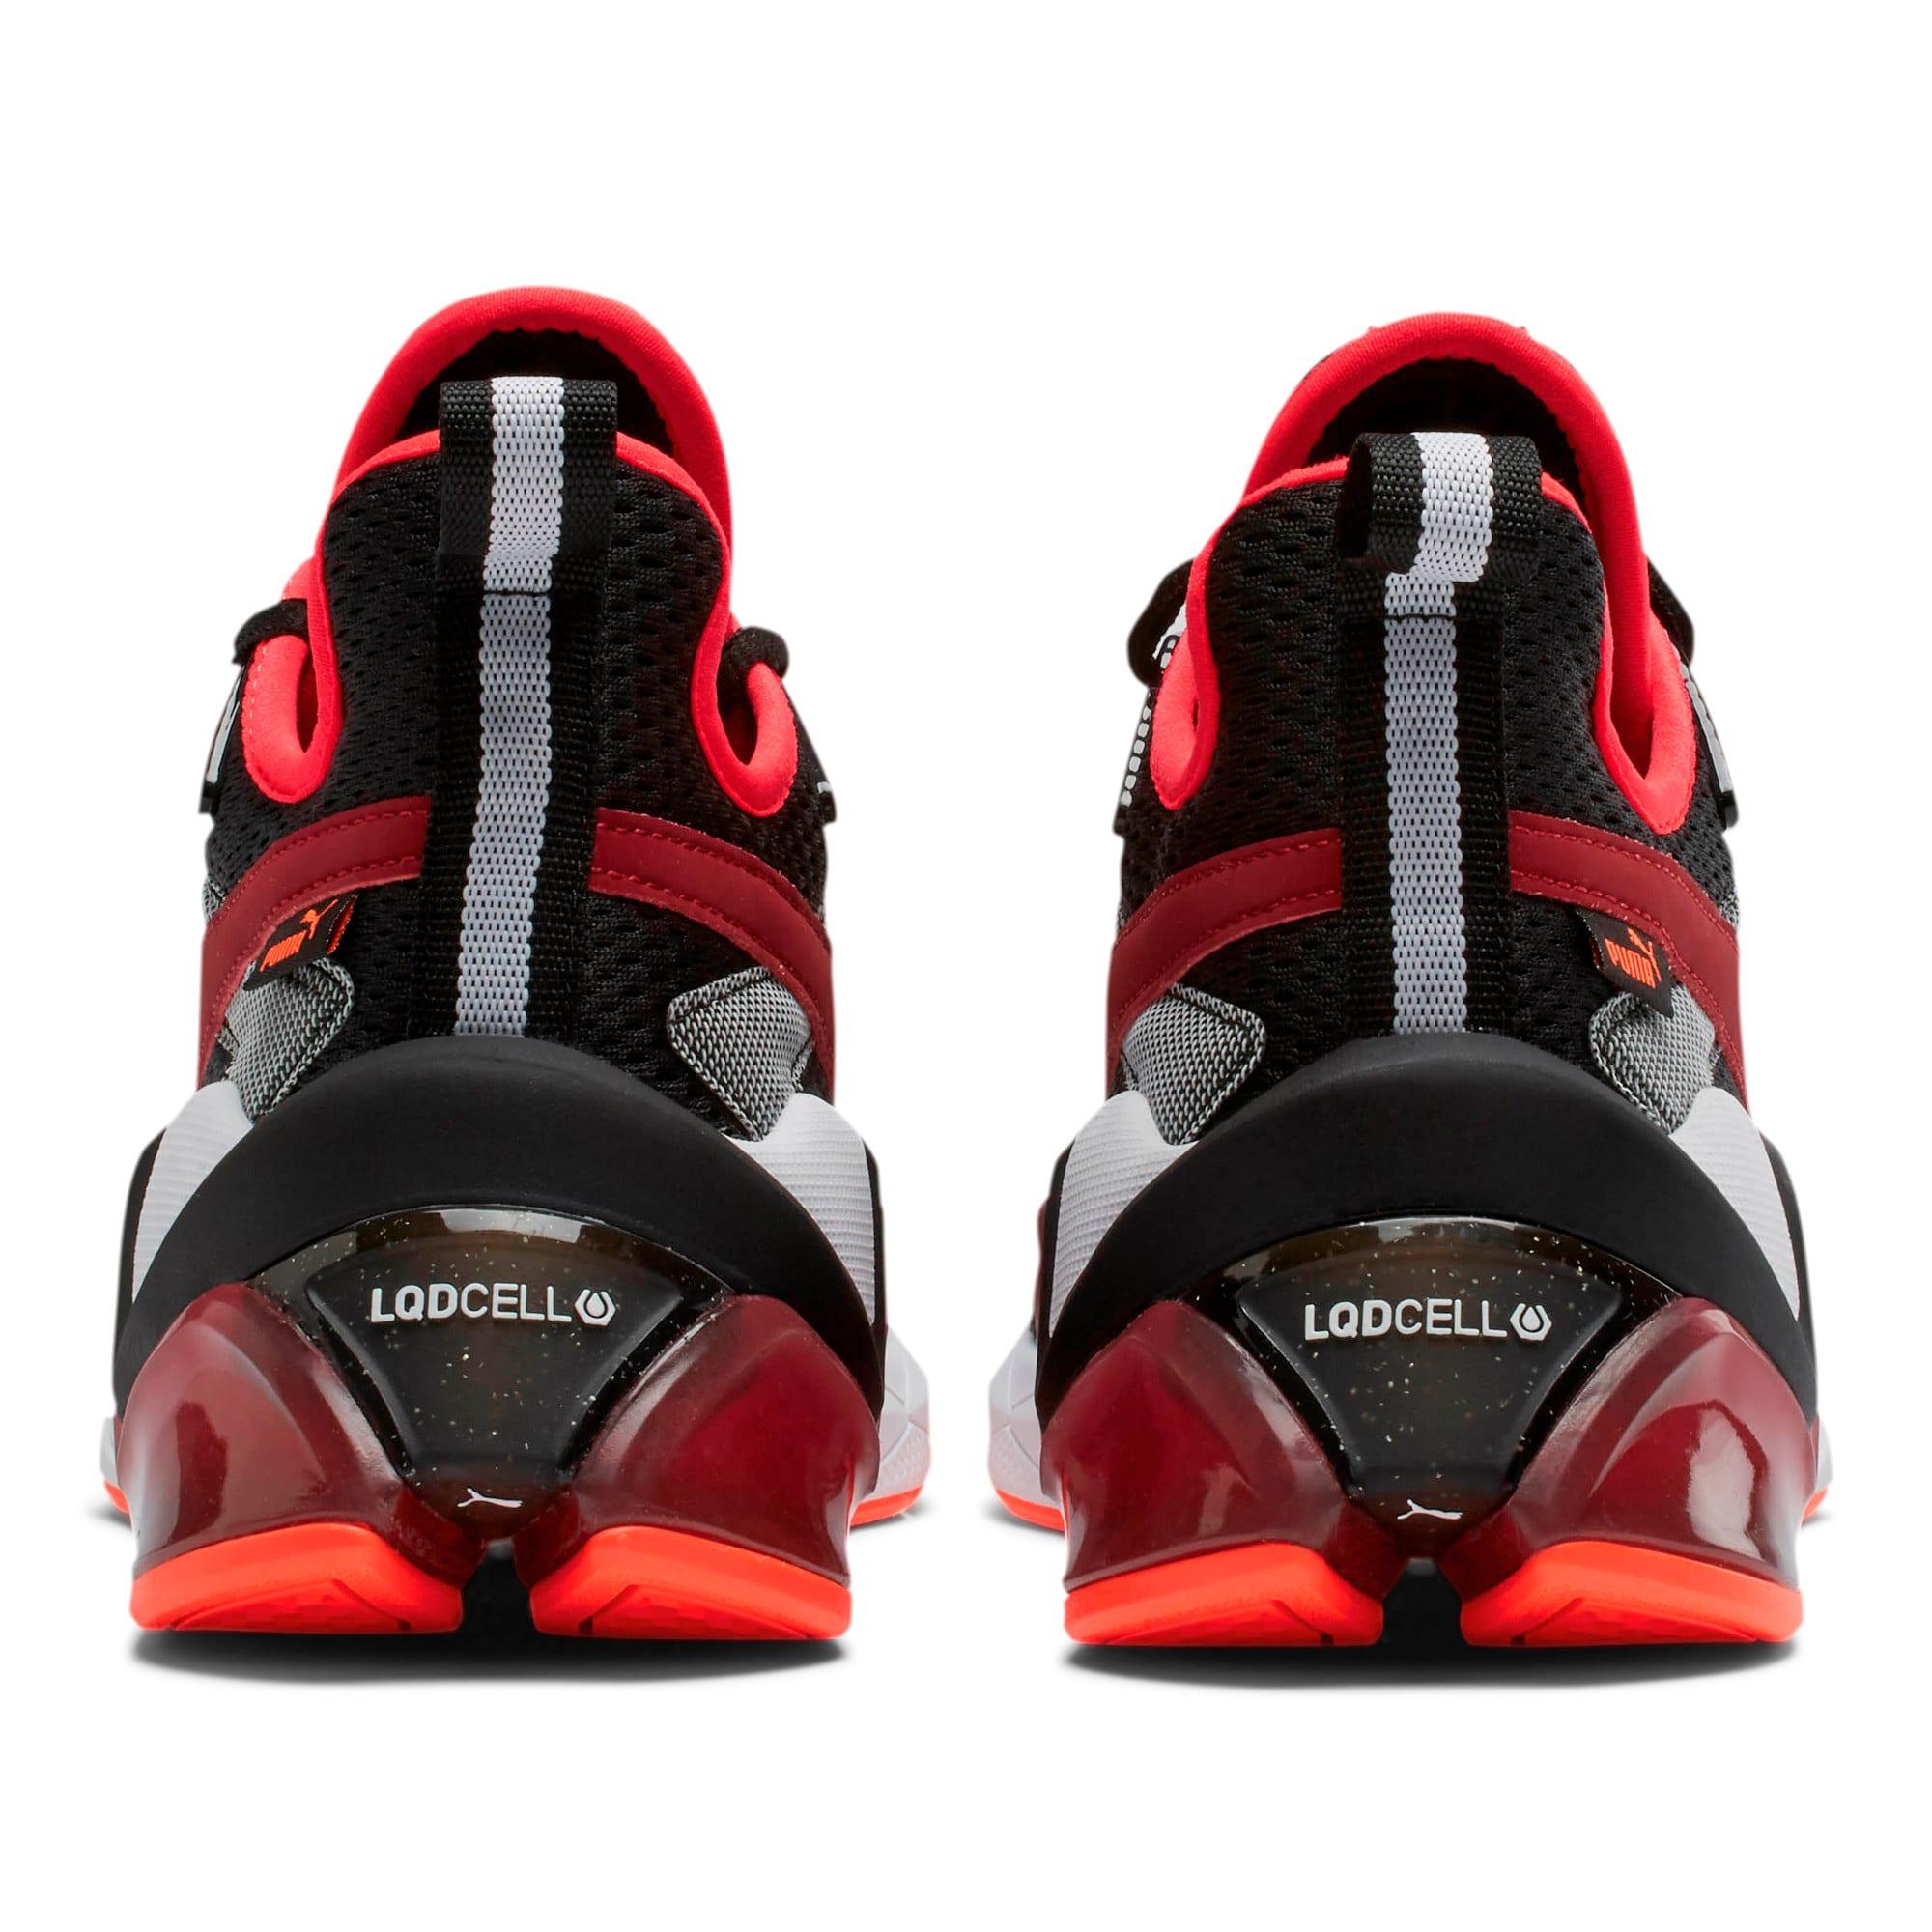 Thumbnail 4 of LQDCELL Origin Tech Men's Training Shoes, Puma Black-Rhubarb, medium